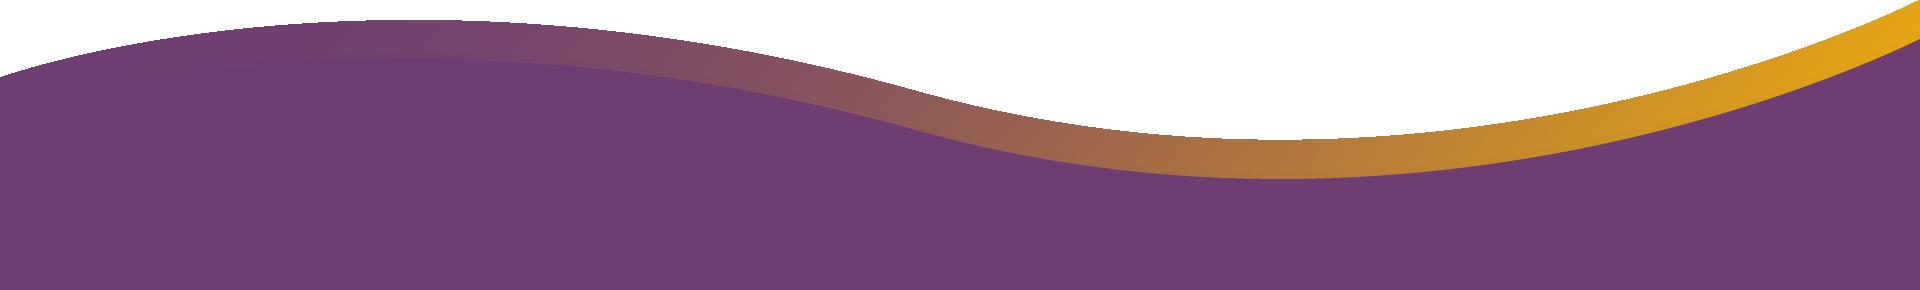 curve-banner